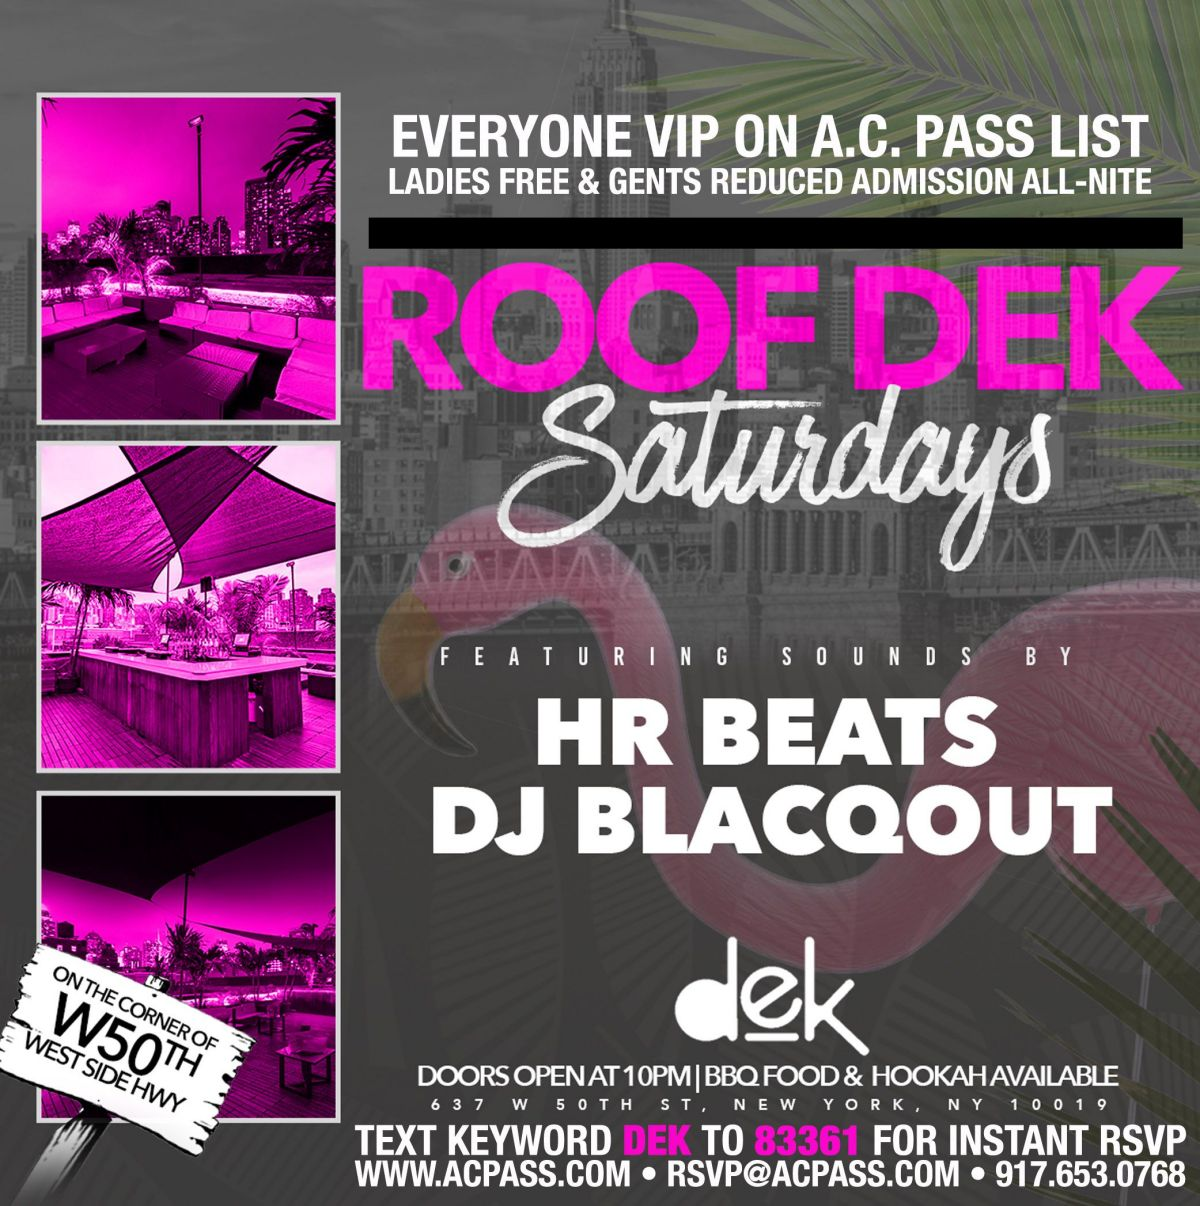 ROOF DEK Saturdays, Free on the A C  Pass List - New York Events